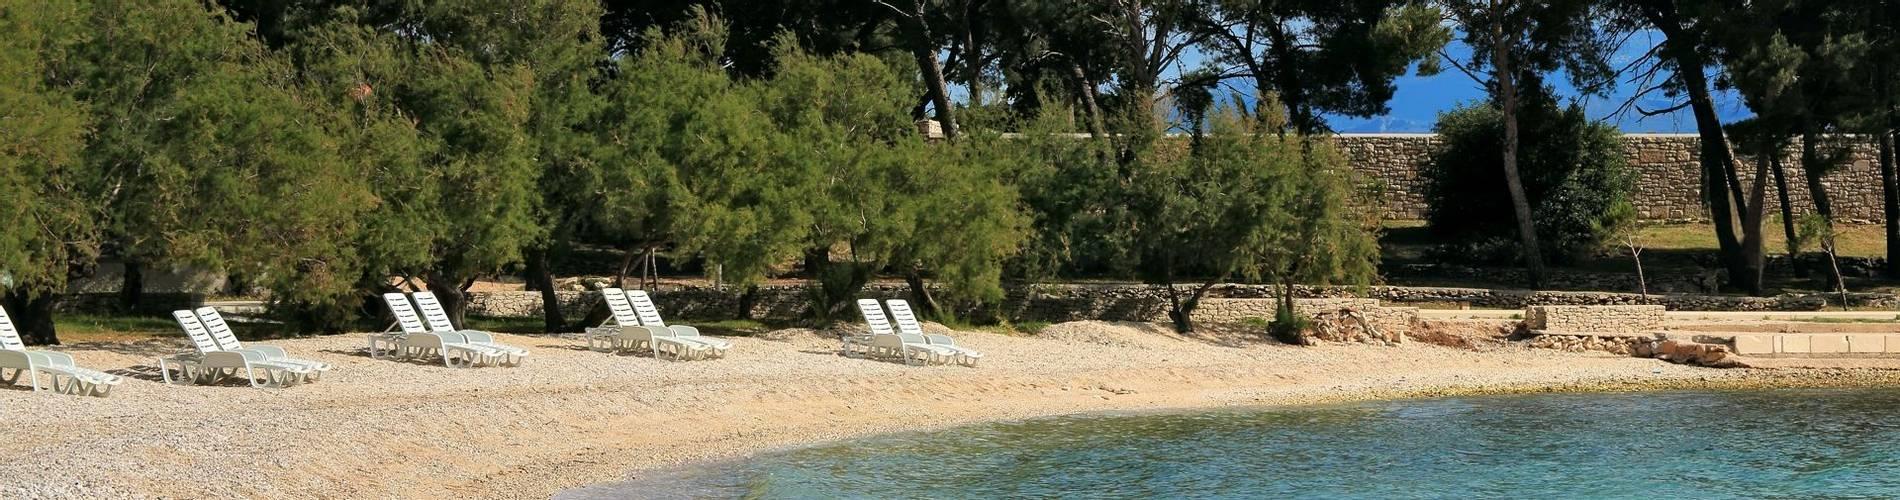 Hotel Villa ADRIATICA 2014 ZSupetar Beach2 4X6 23MB.jpg